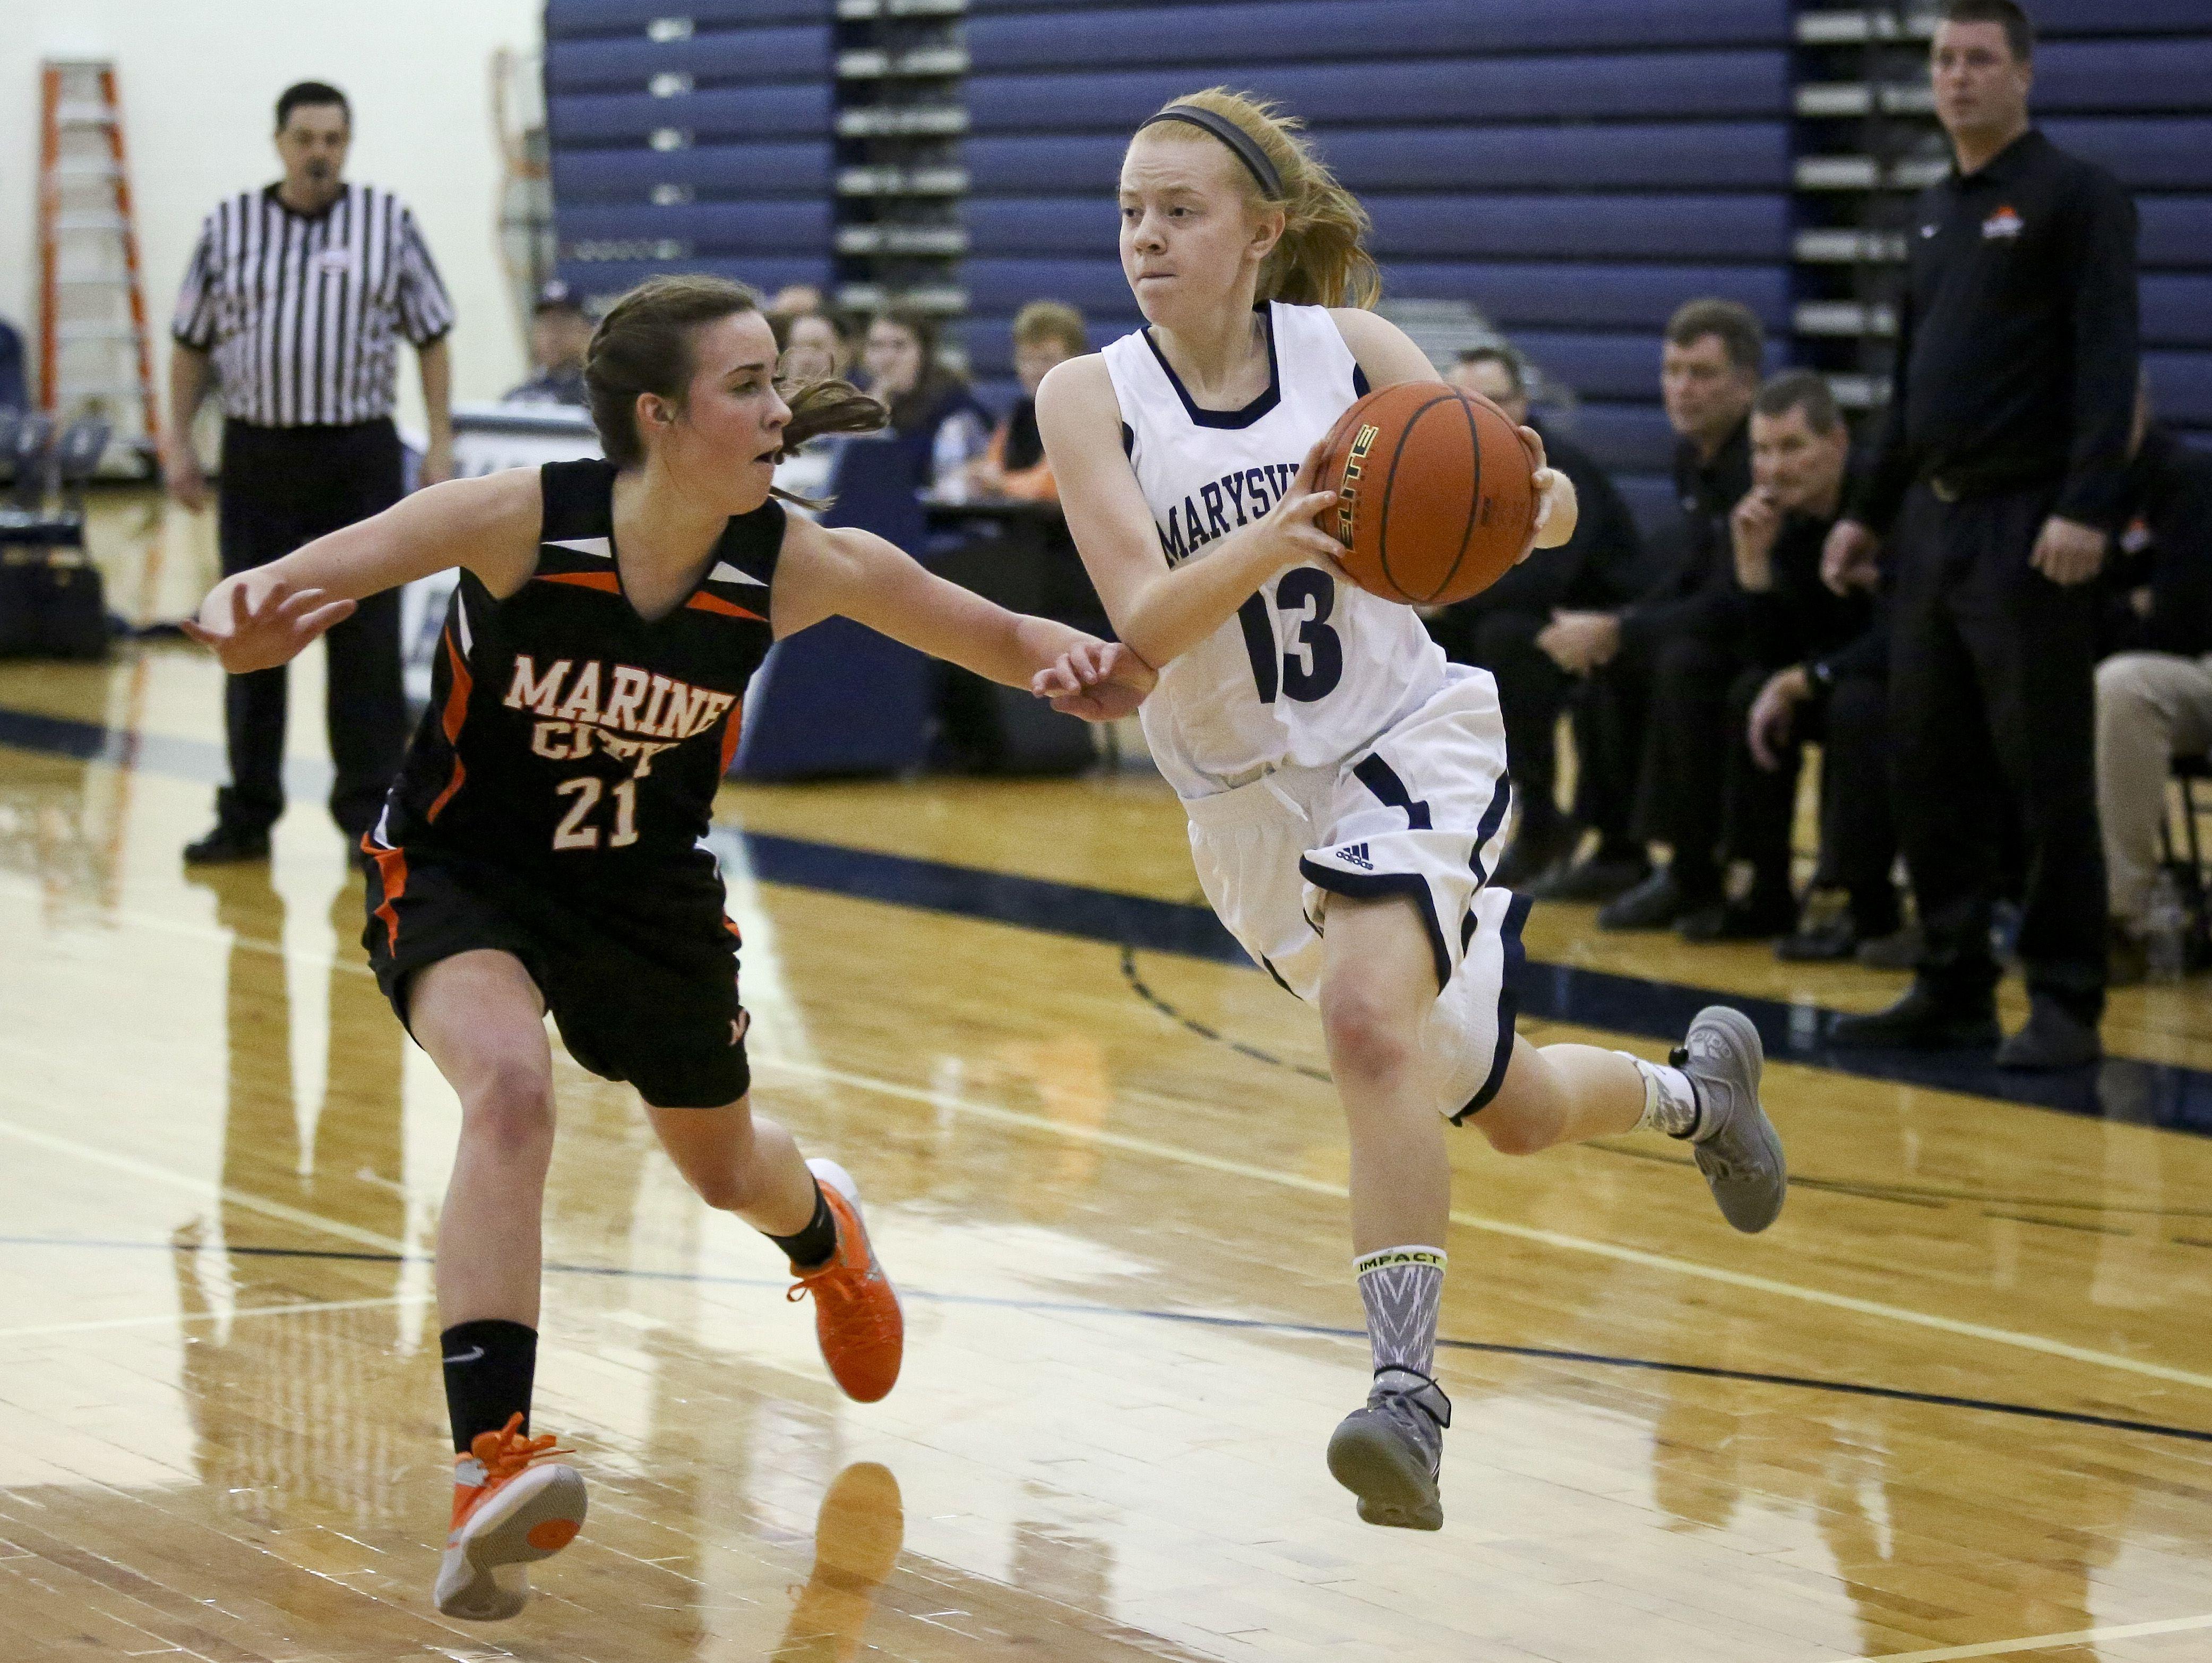 Marysville junior Kiara Kelley drives the ball past Marine City sophomore Stephanie Abraham during a basketball game Friday, Jan. 8, 2016 at Marysville High School.